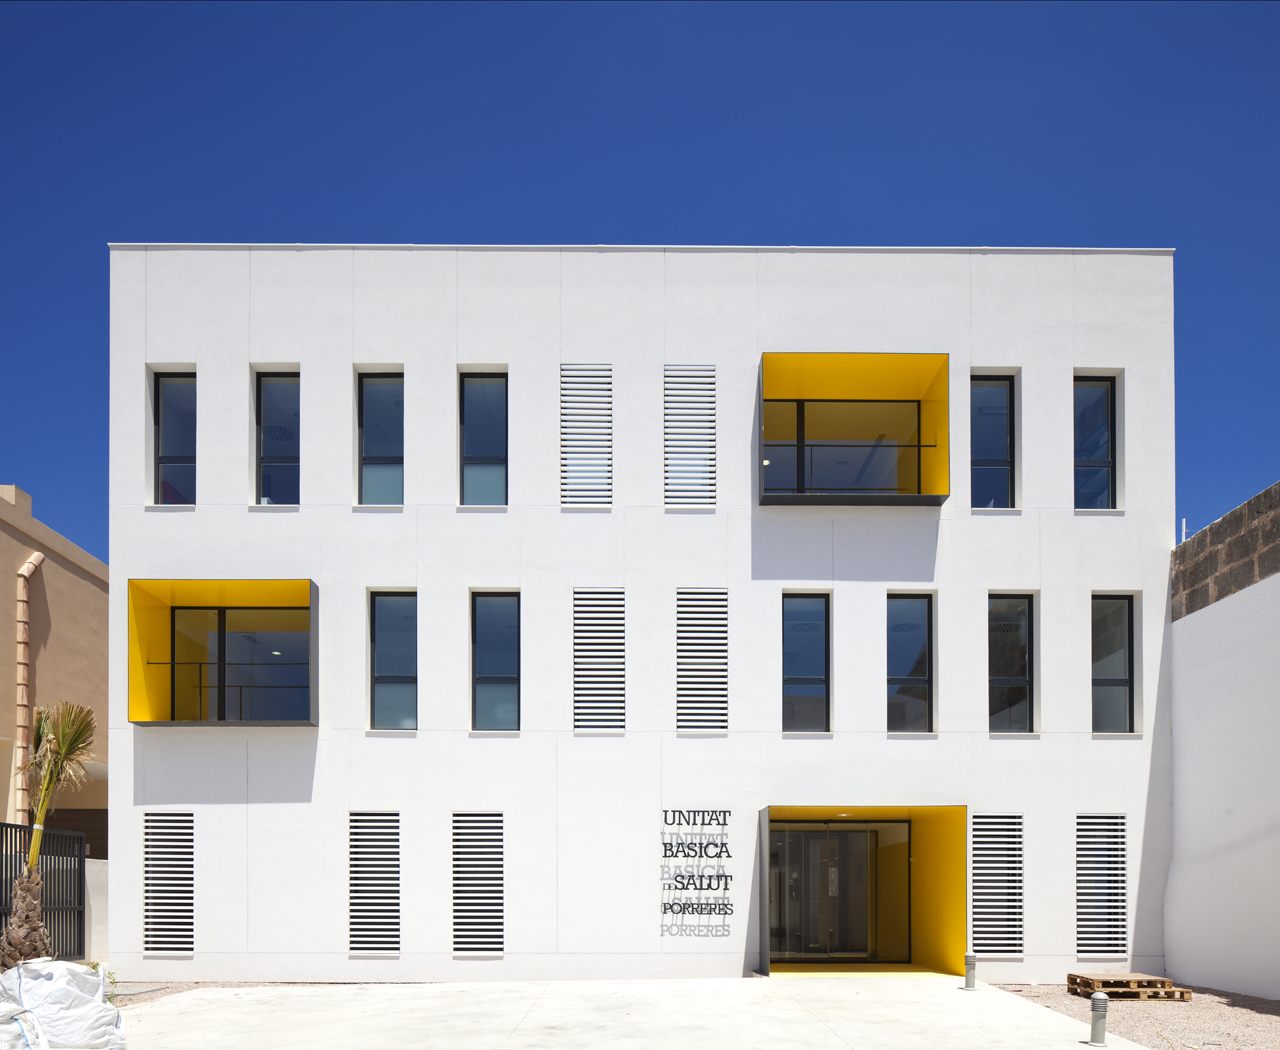 Centro de Saúde de Porreres / MACA Estudio de Arquitectura, © Jaime Sicilia